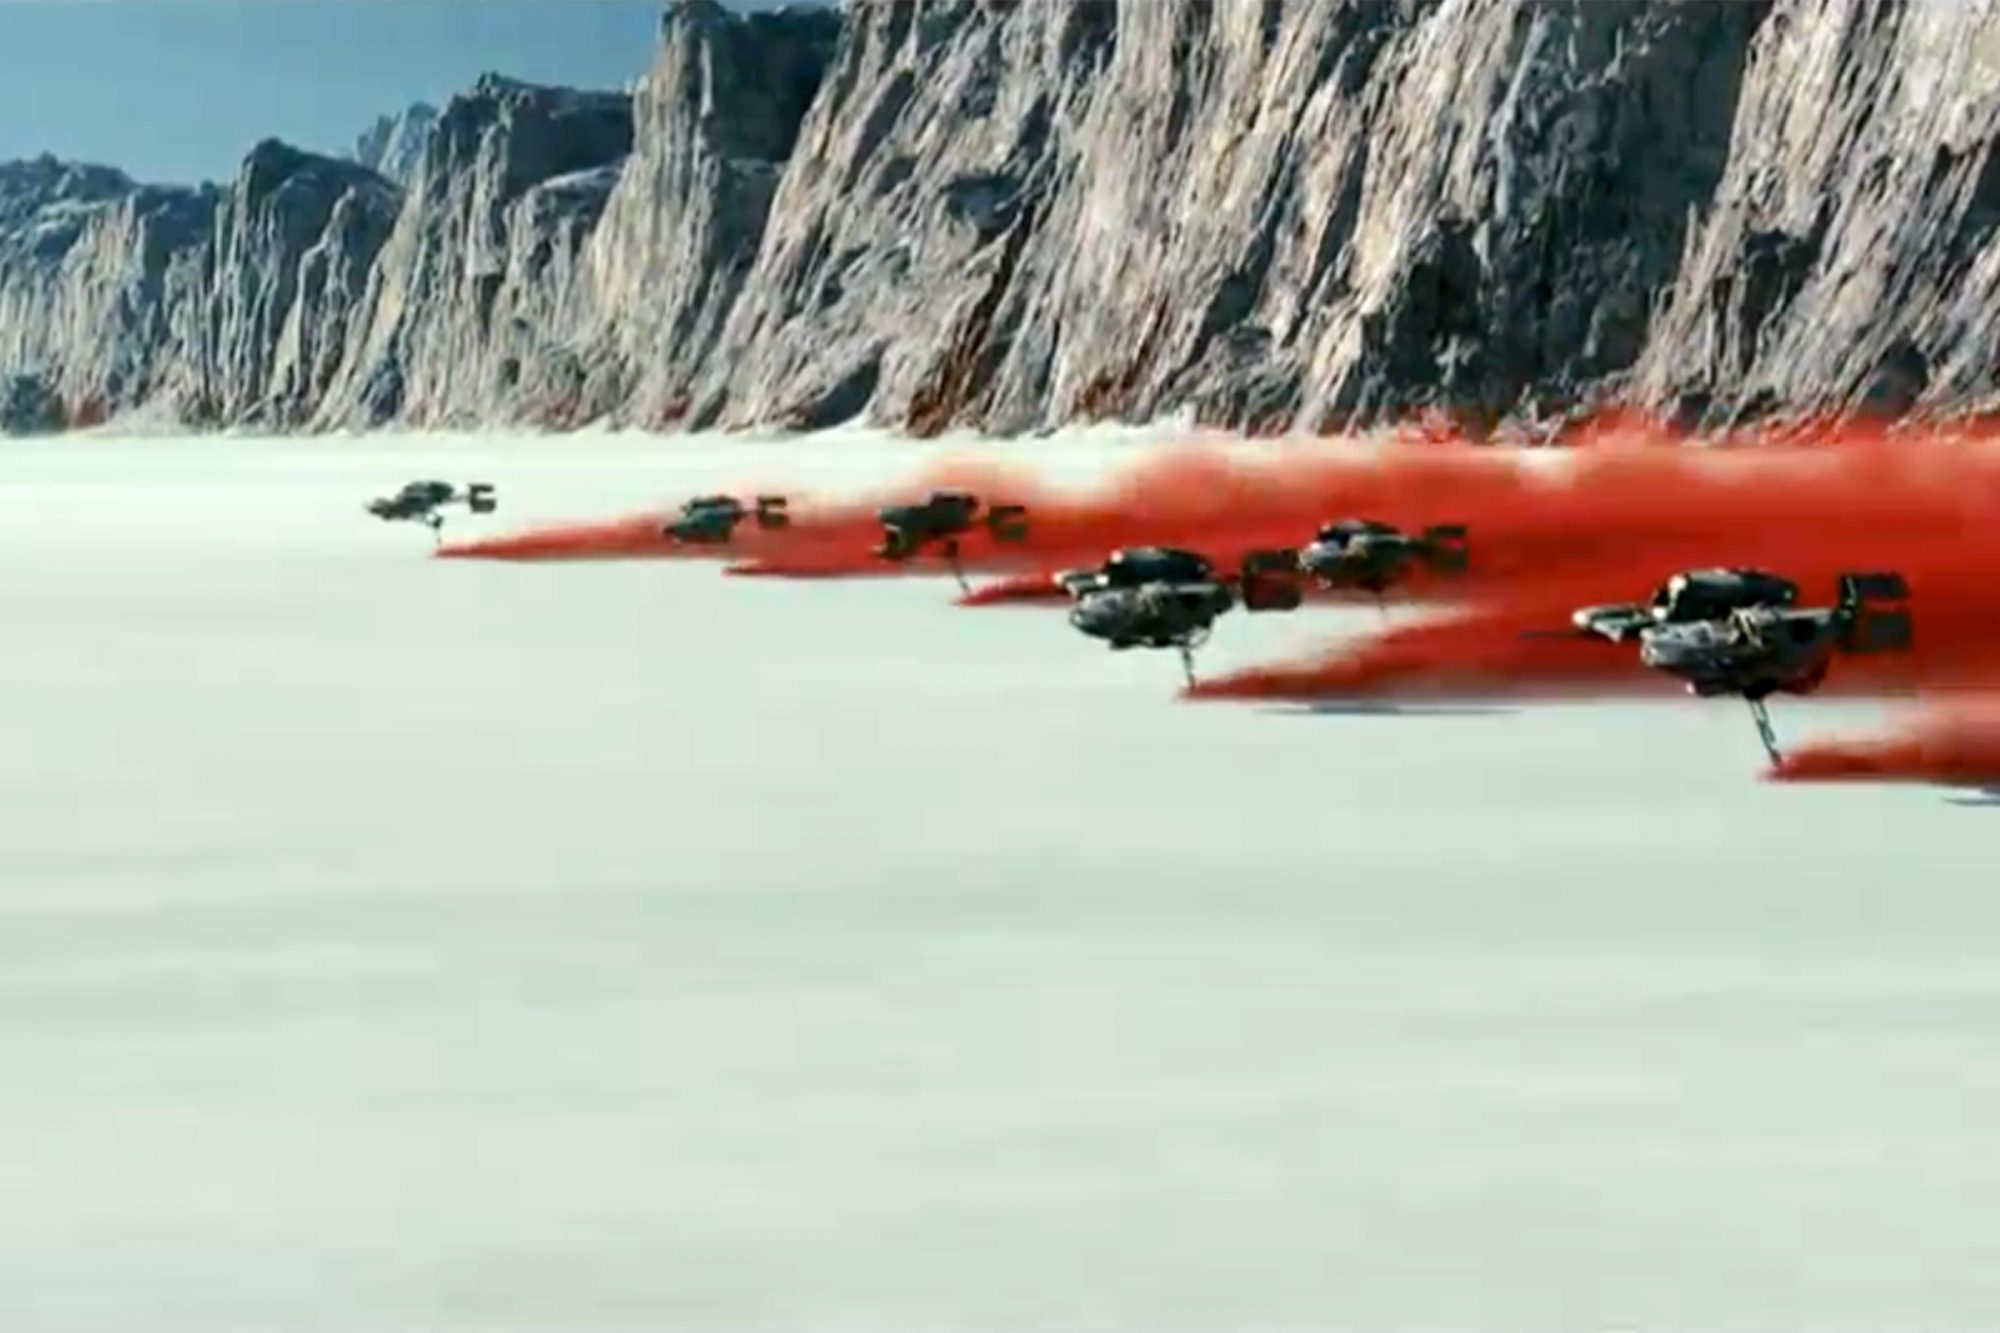 Star Wars Episode VIII The Last Jedi screen grab